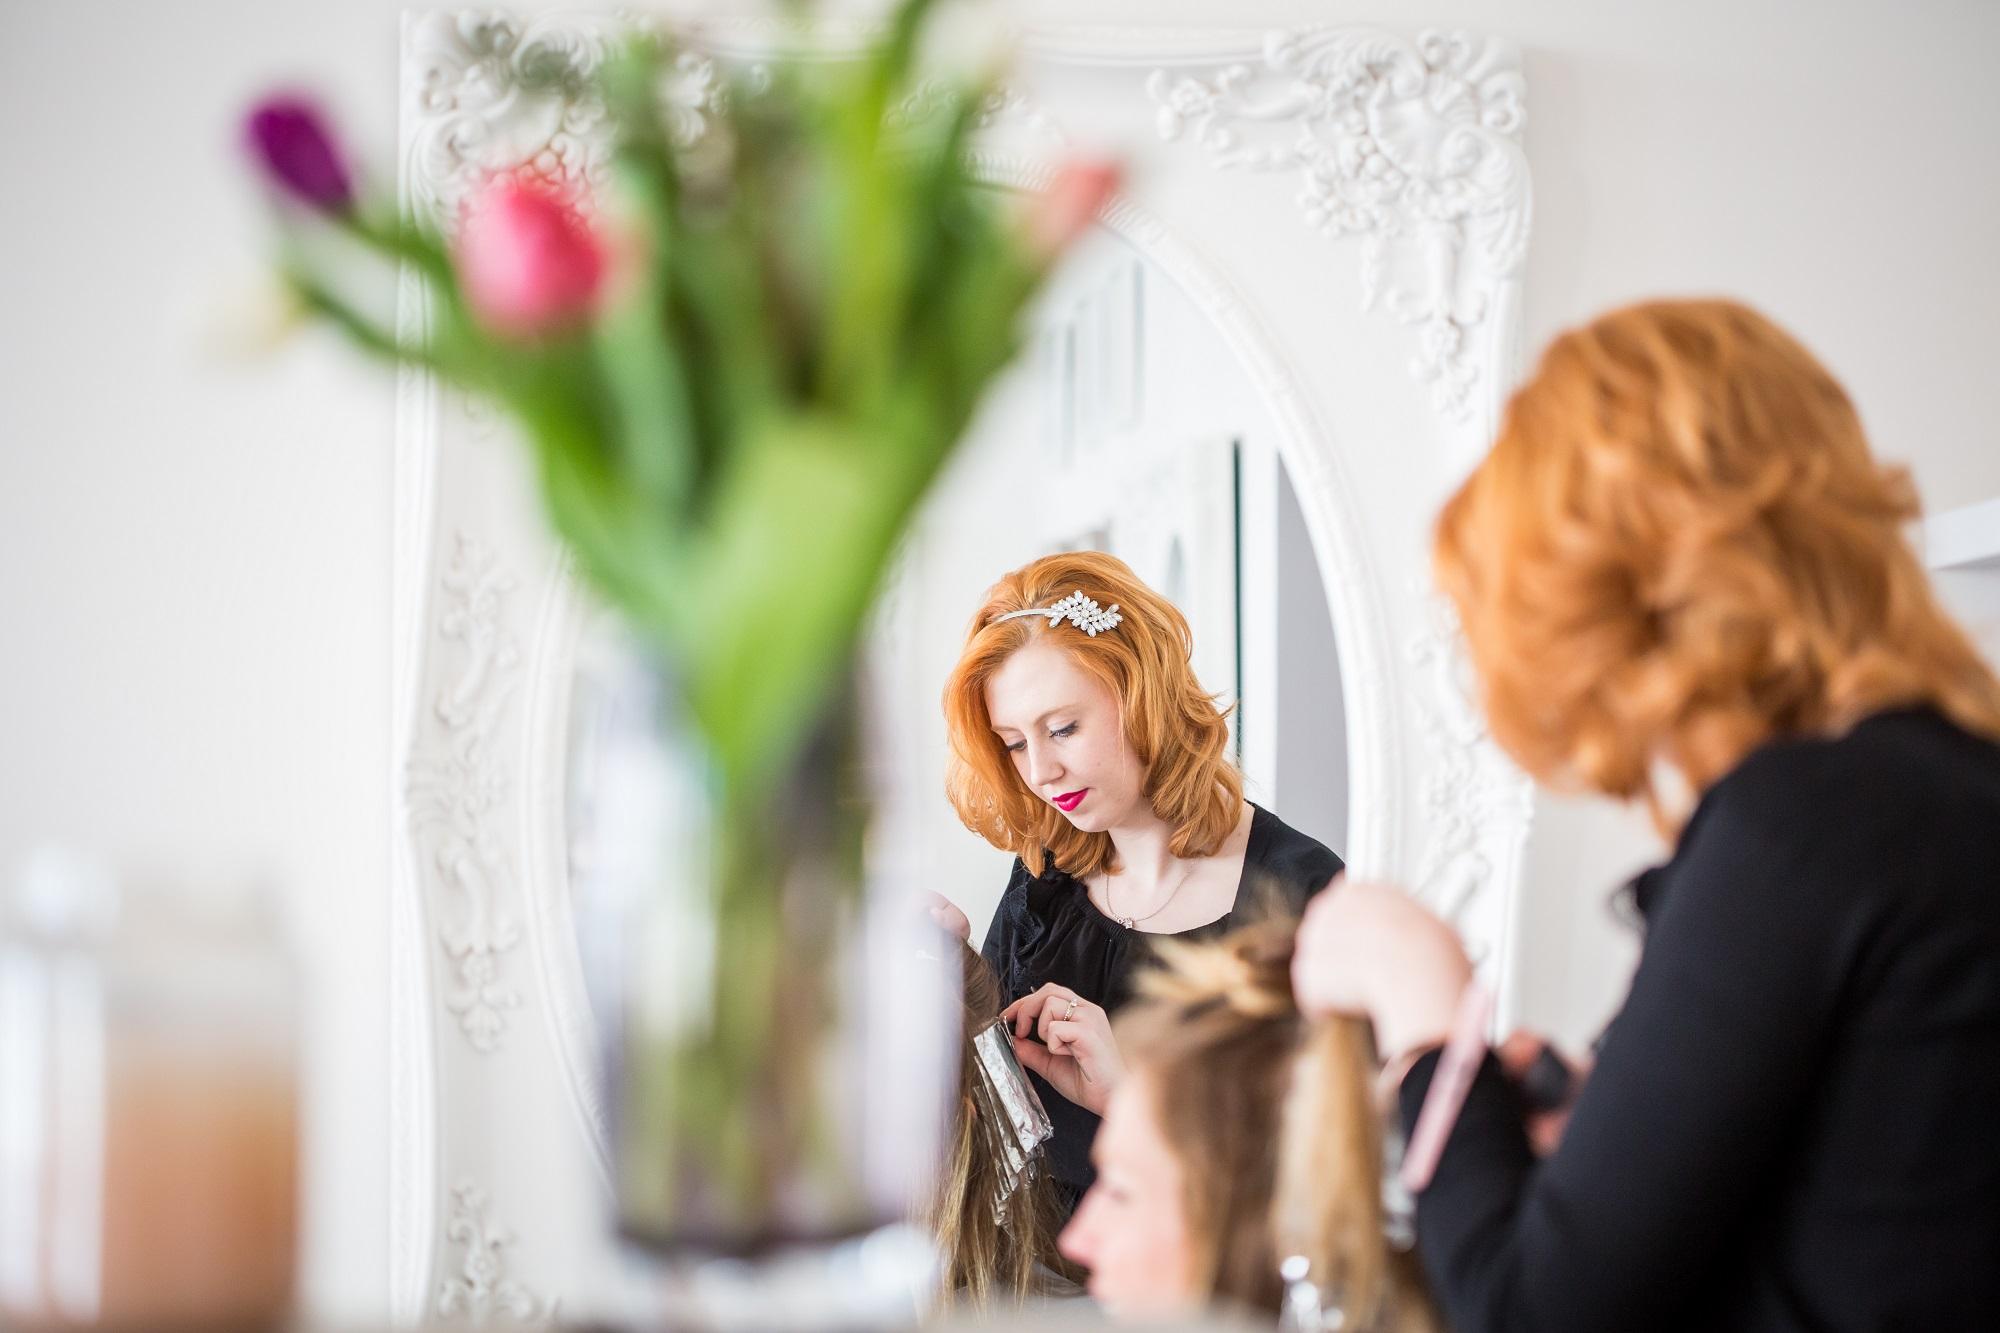 Claire-Hair-074-Barnstaple-photographer-rebecca-roundhill.jpg